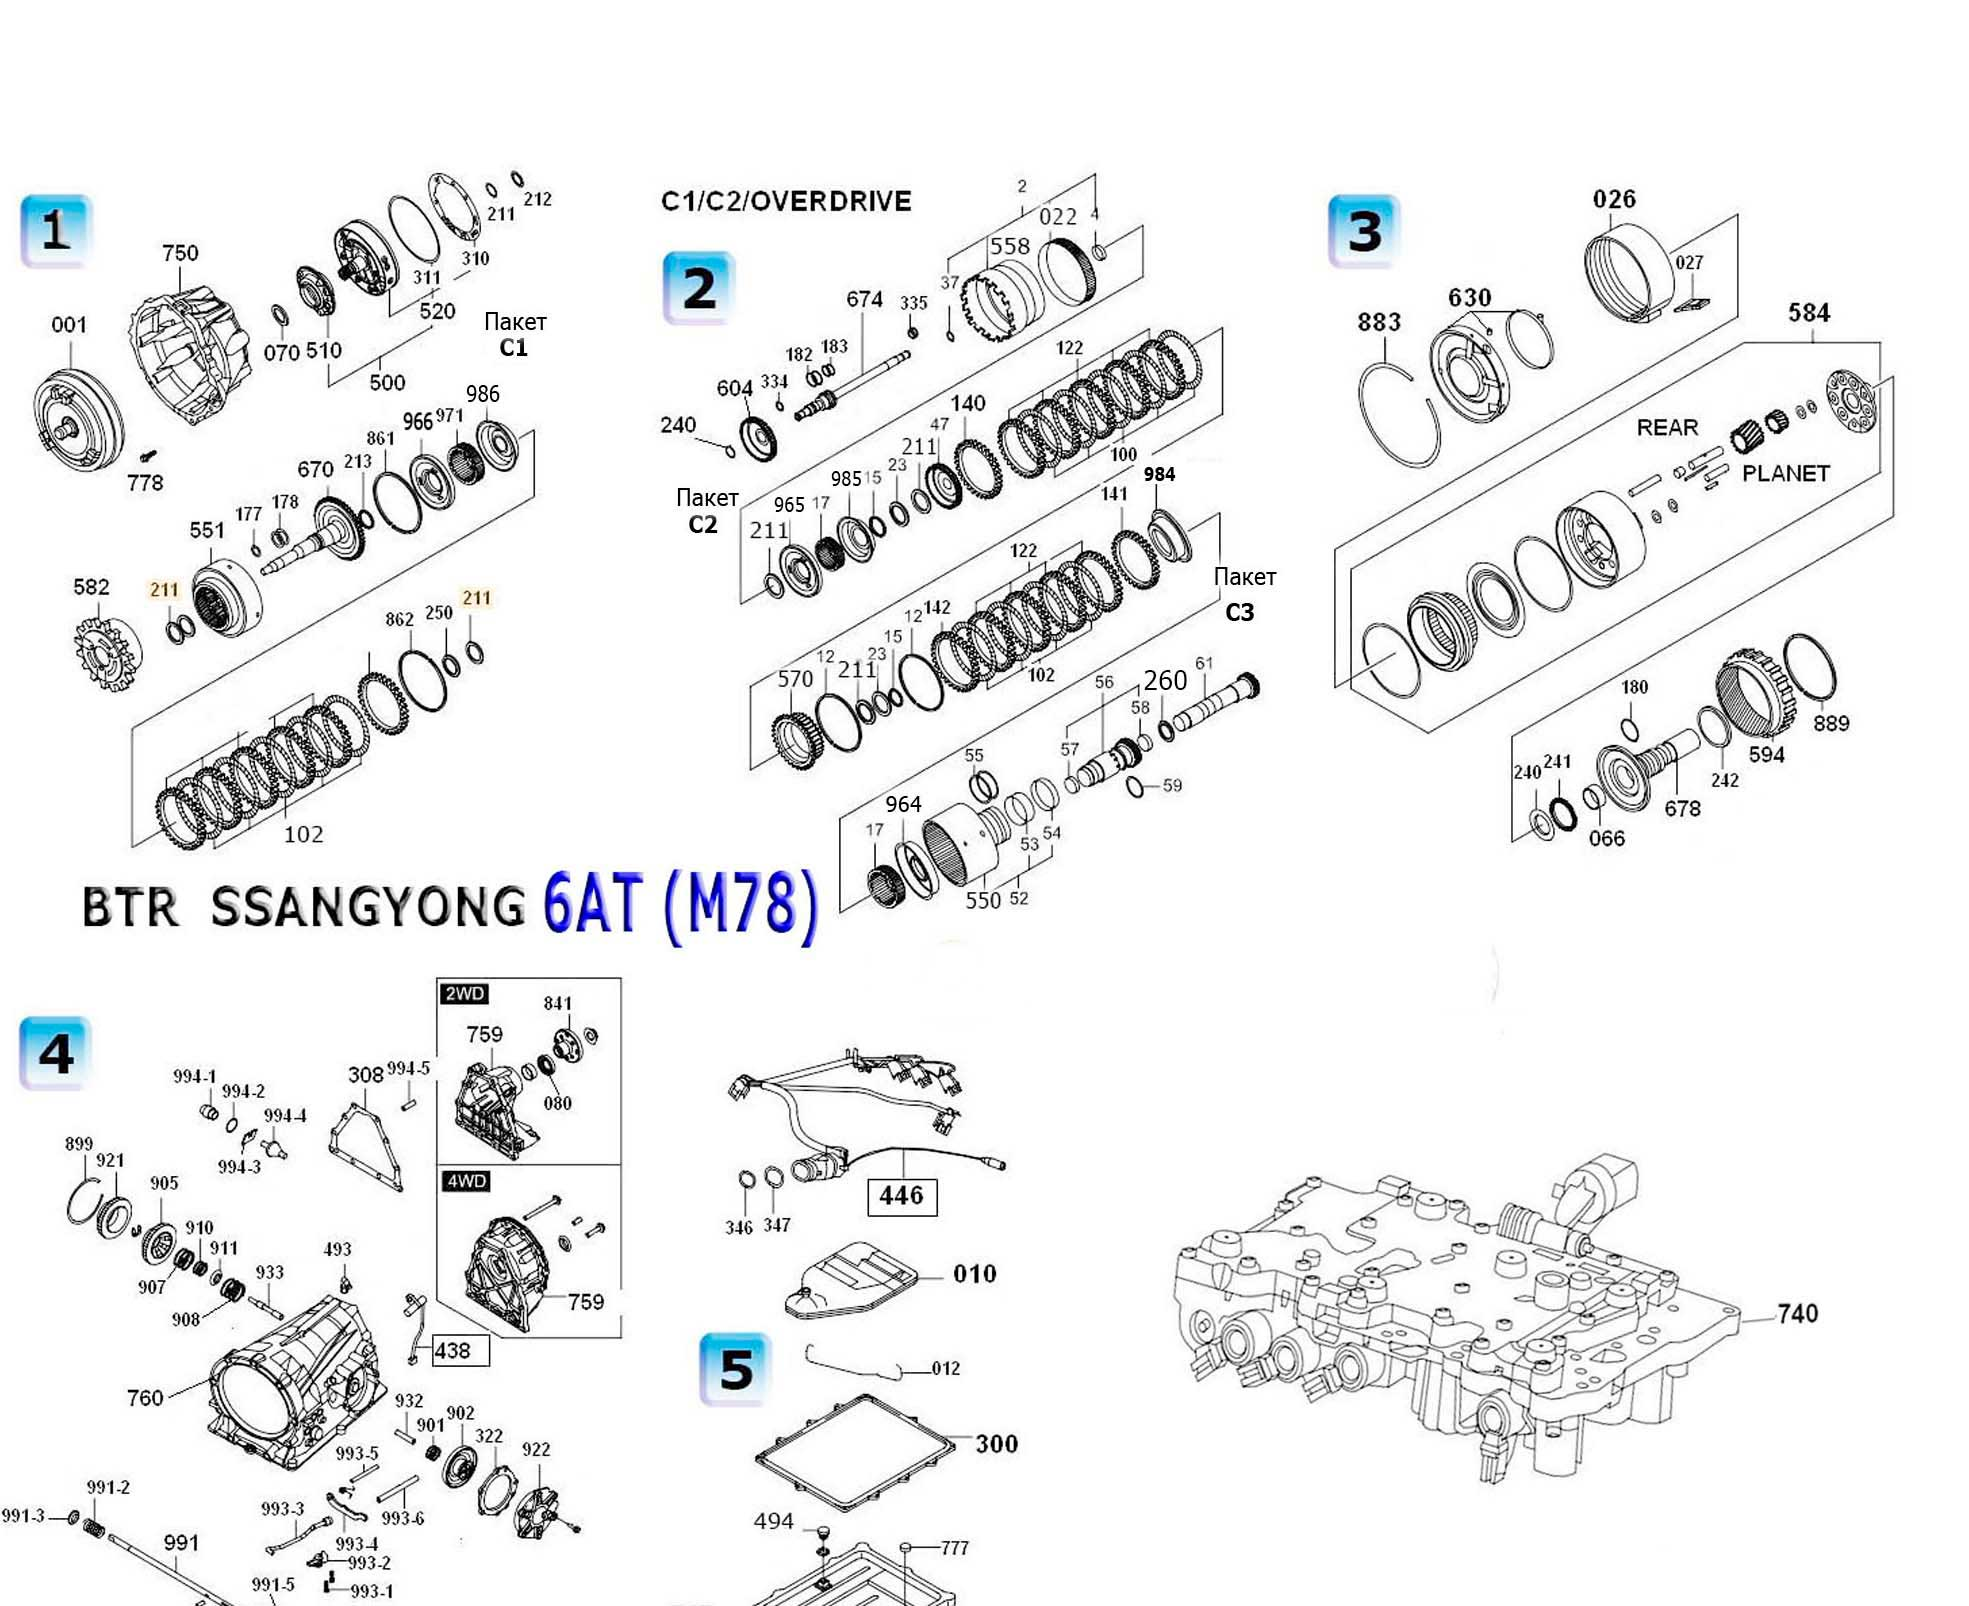 Transmission Repair Manuals Btr M78 Dsi